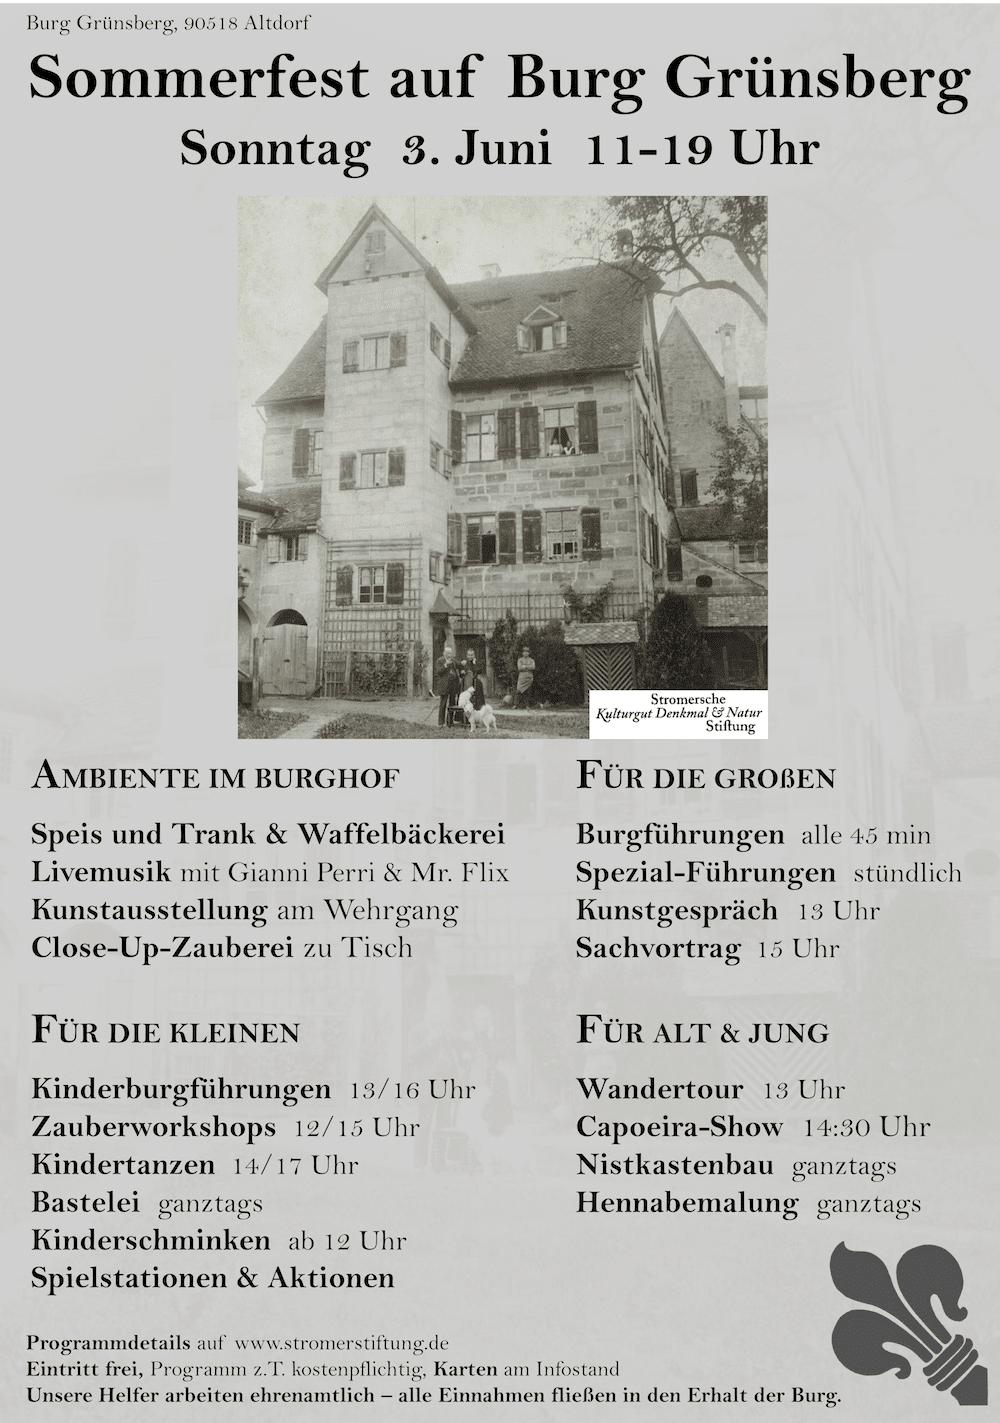 Sommerfest 2018 der Burg Grünsberg